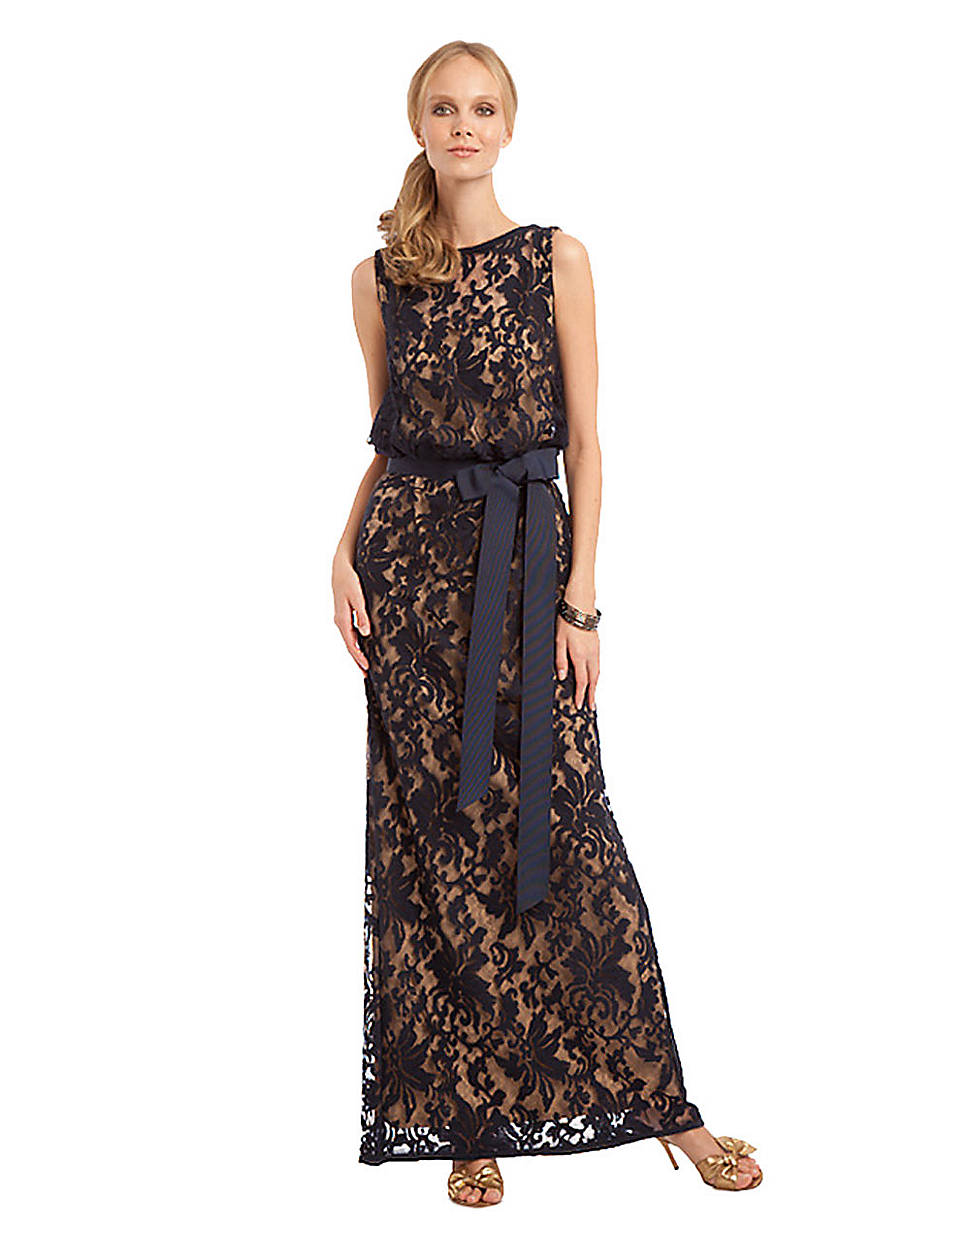 Tadashi shoji dresses lord and taylor - September 2018 Wholesale